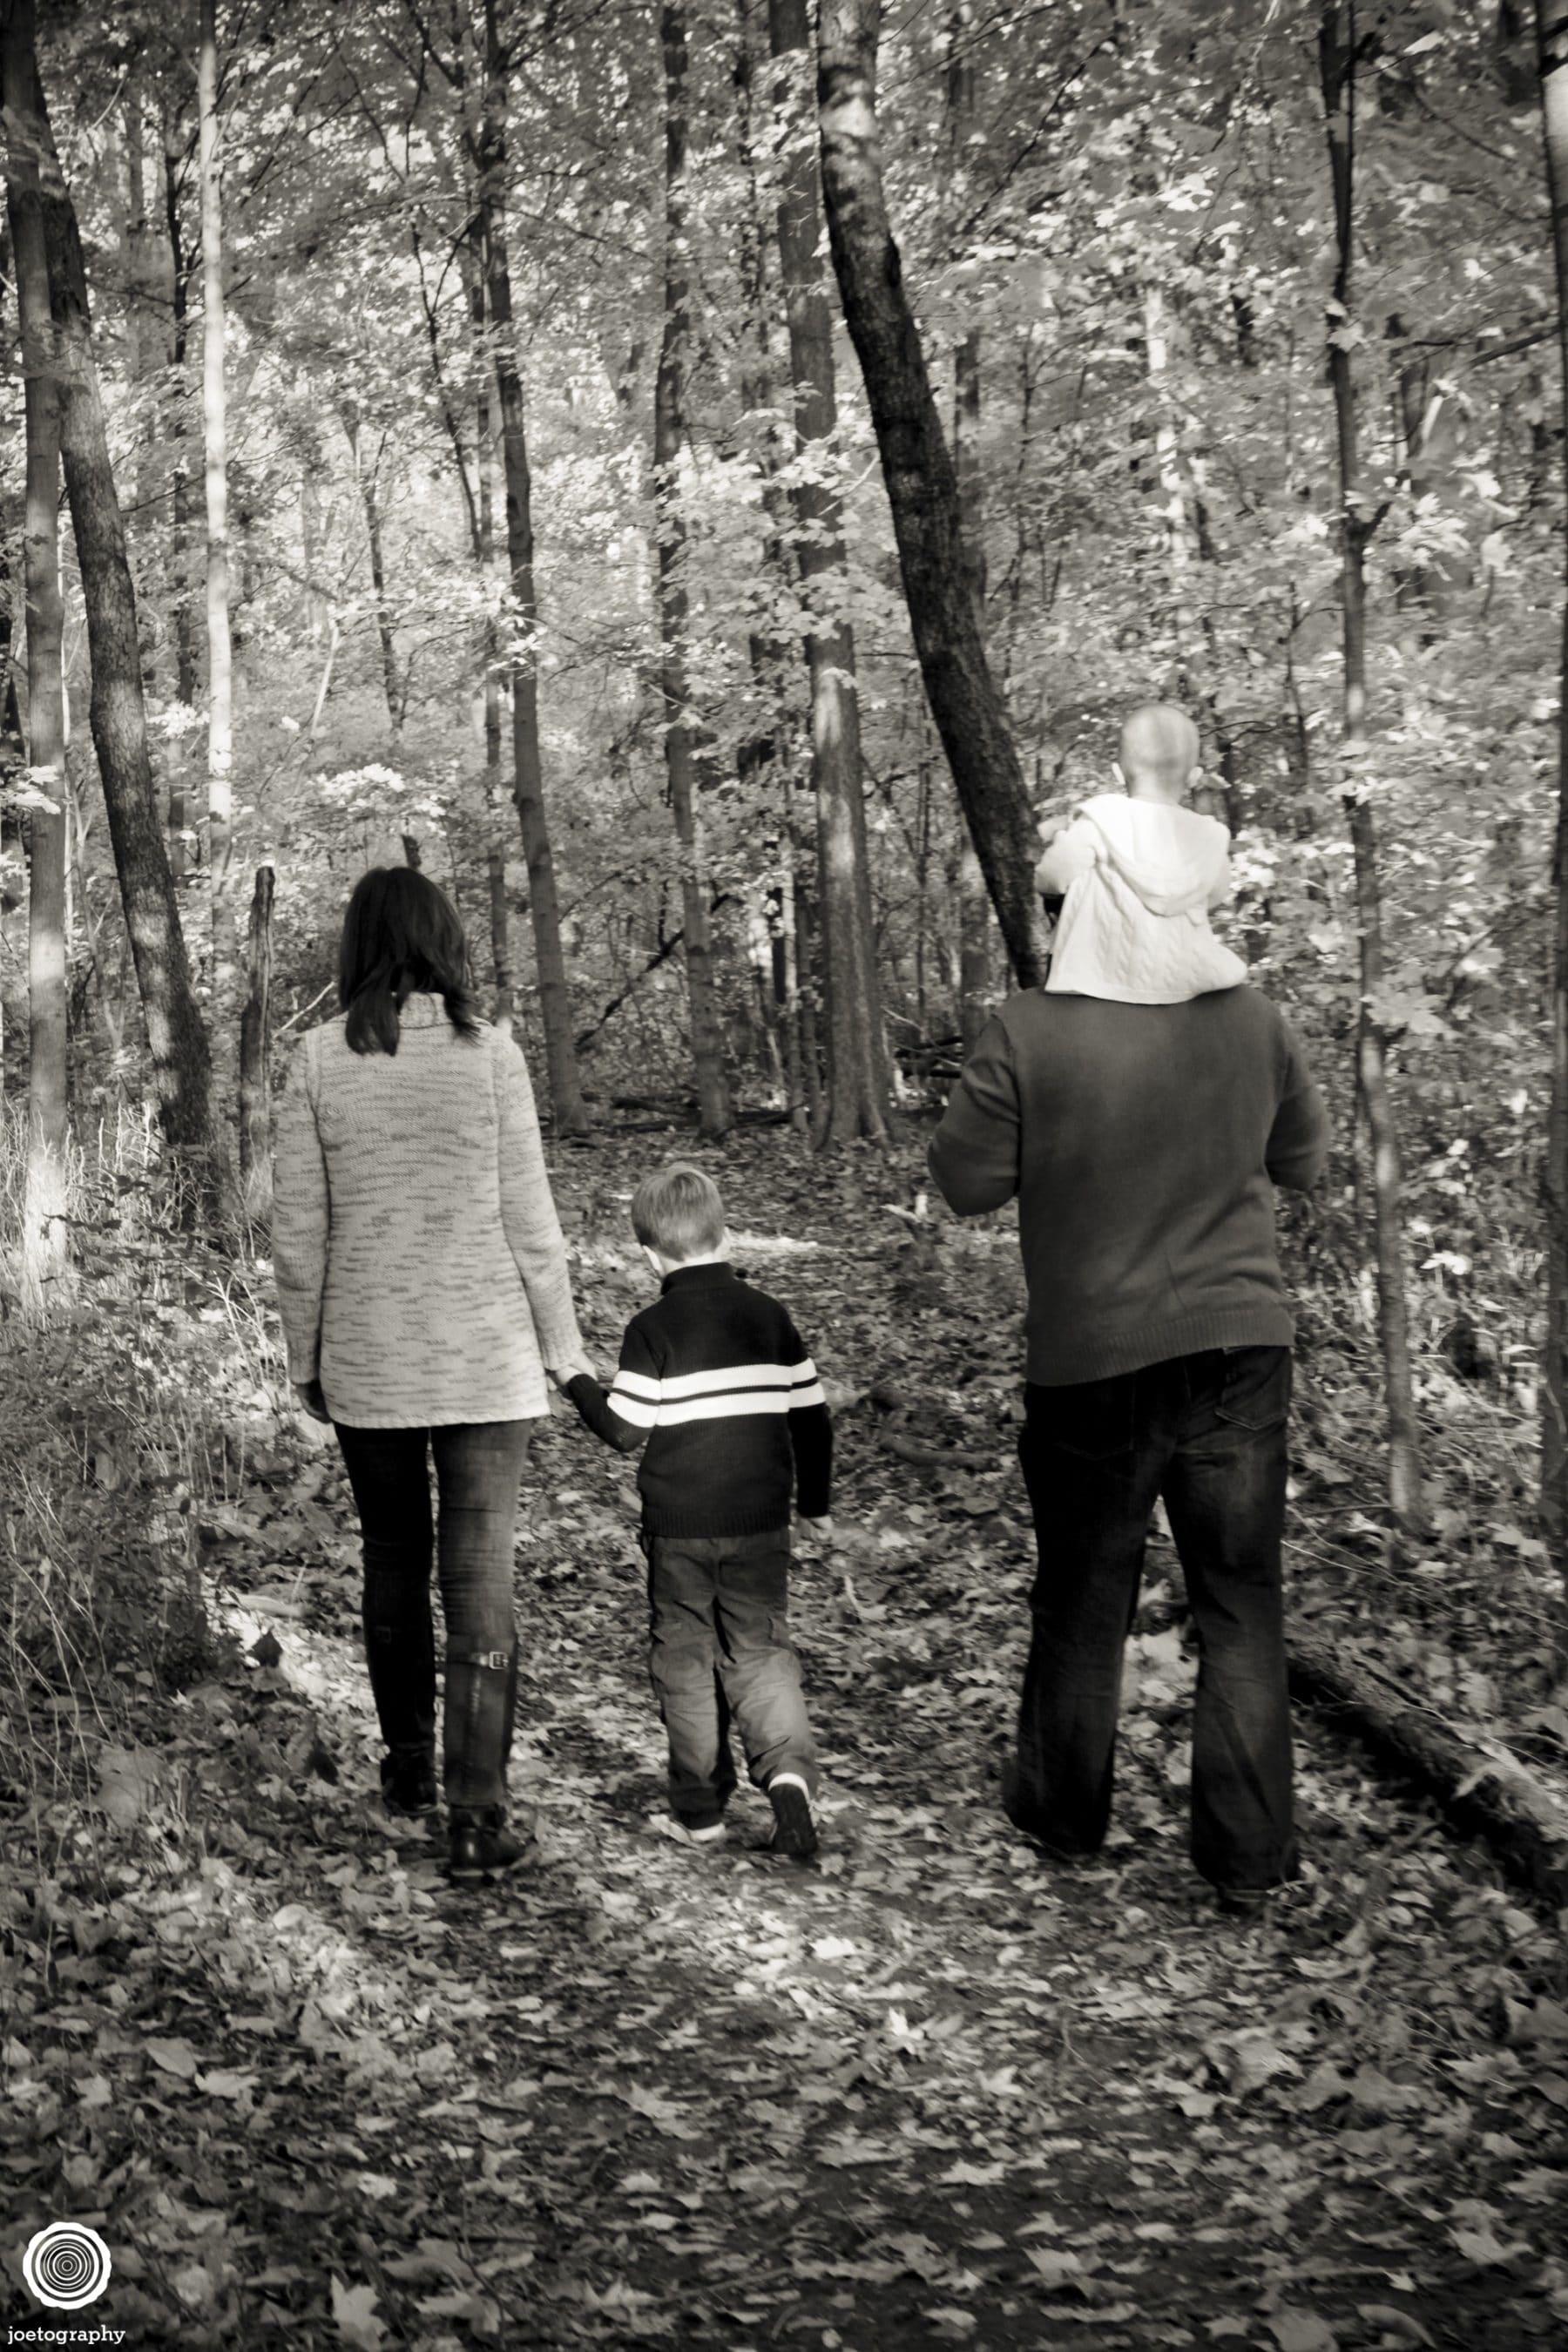 Albert-Family-Photographs-Fishers-Indiana-21